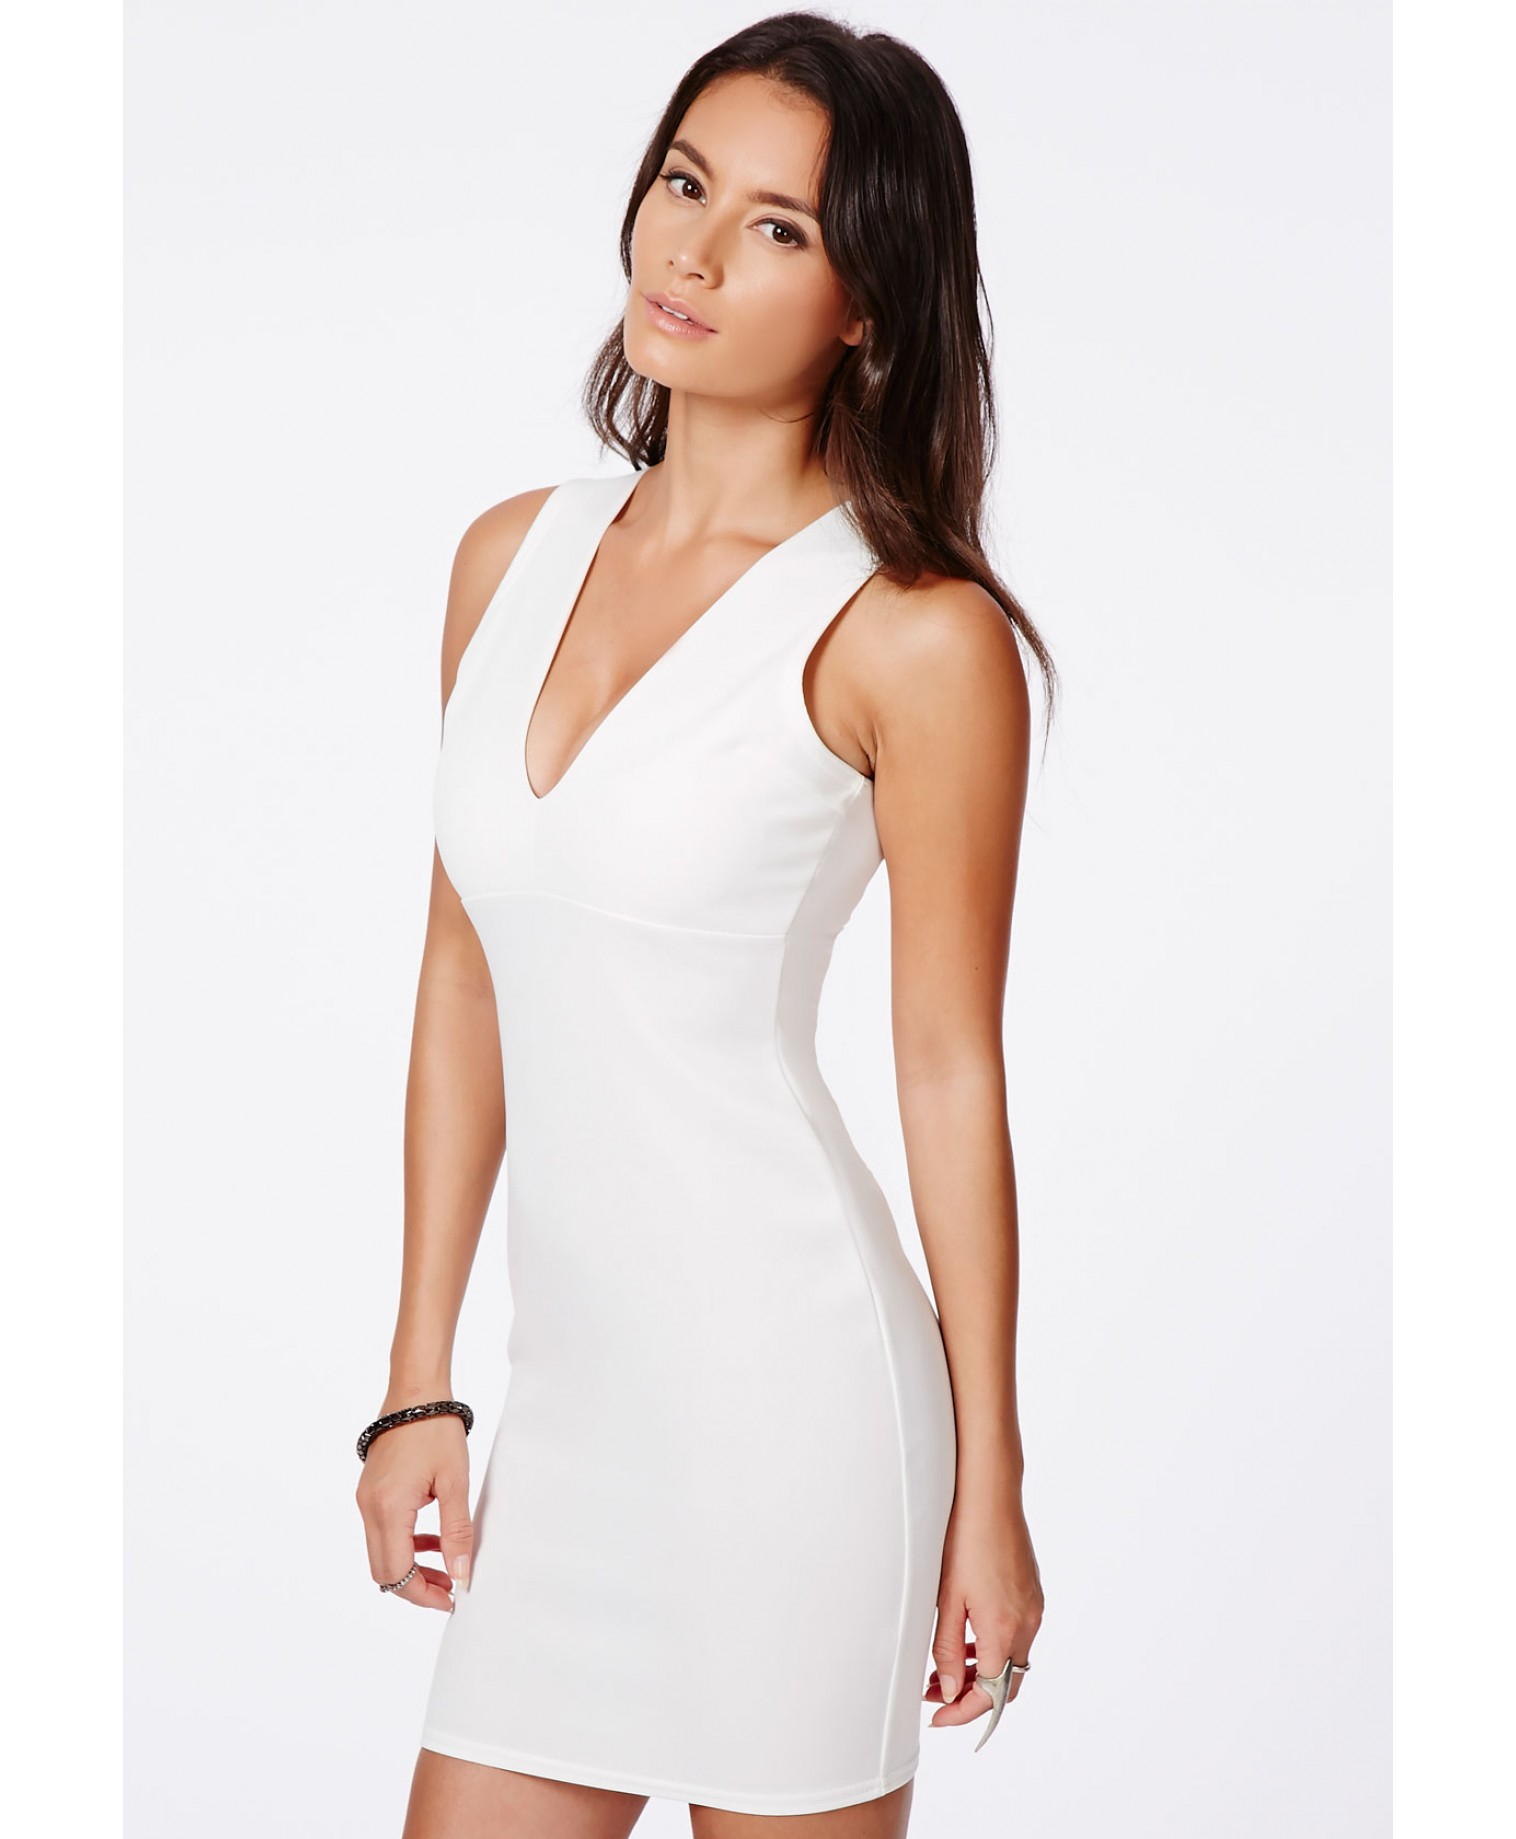 4268c4d90d Lyst - Missguided Kesari White Plunge Neck Bodycon Mini Dress in White